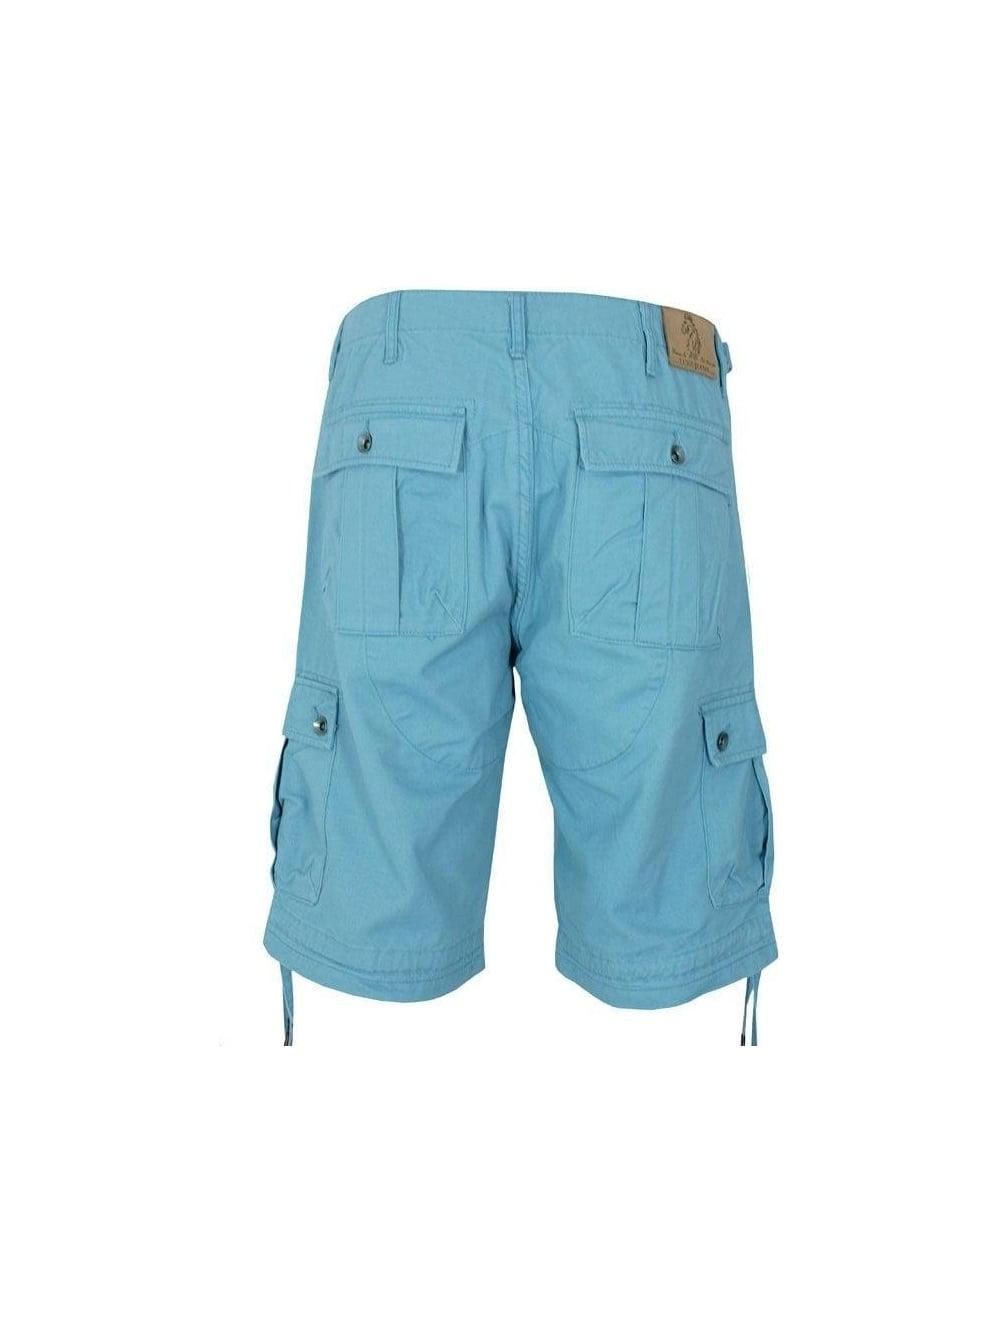 Mens Luke 1977 Knockers Long Cargo Shorts - Blue Cement  21bd410bb69e